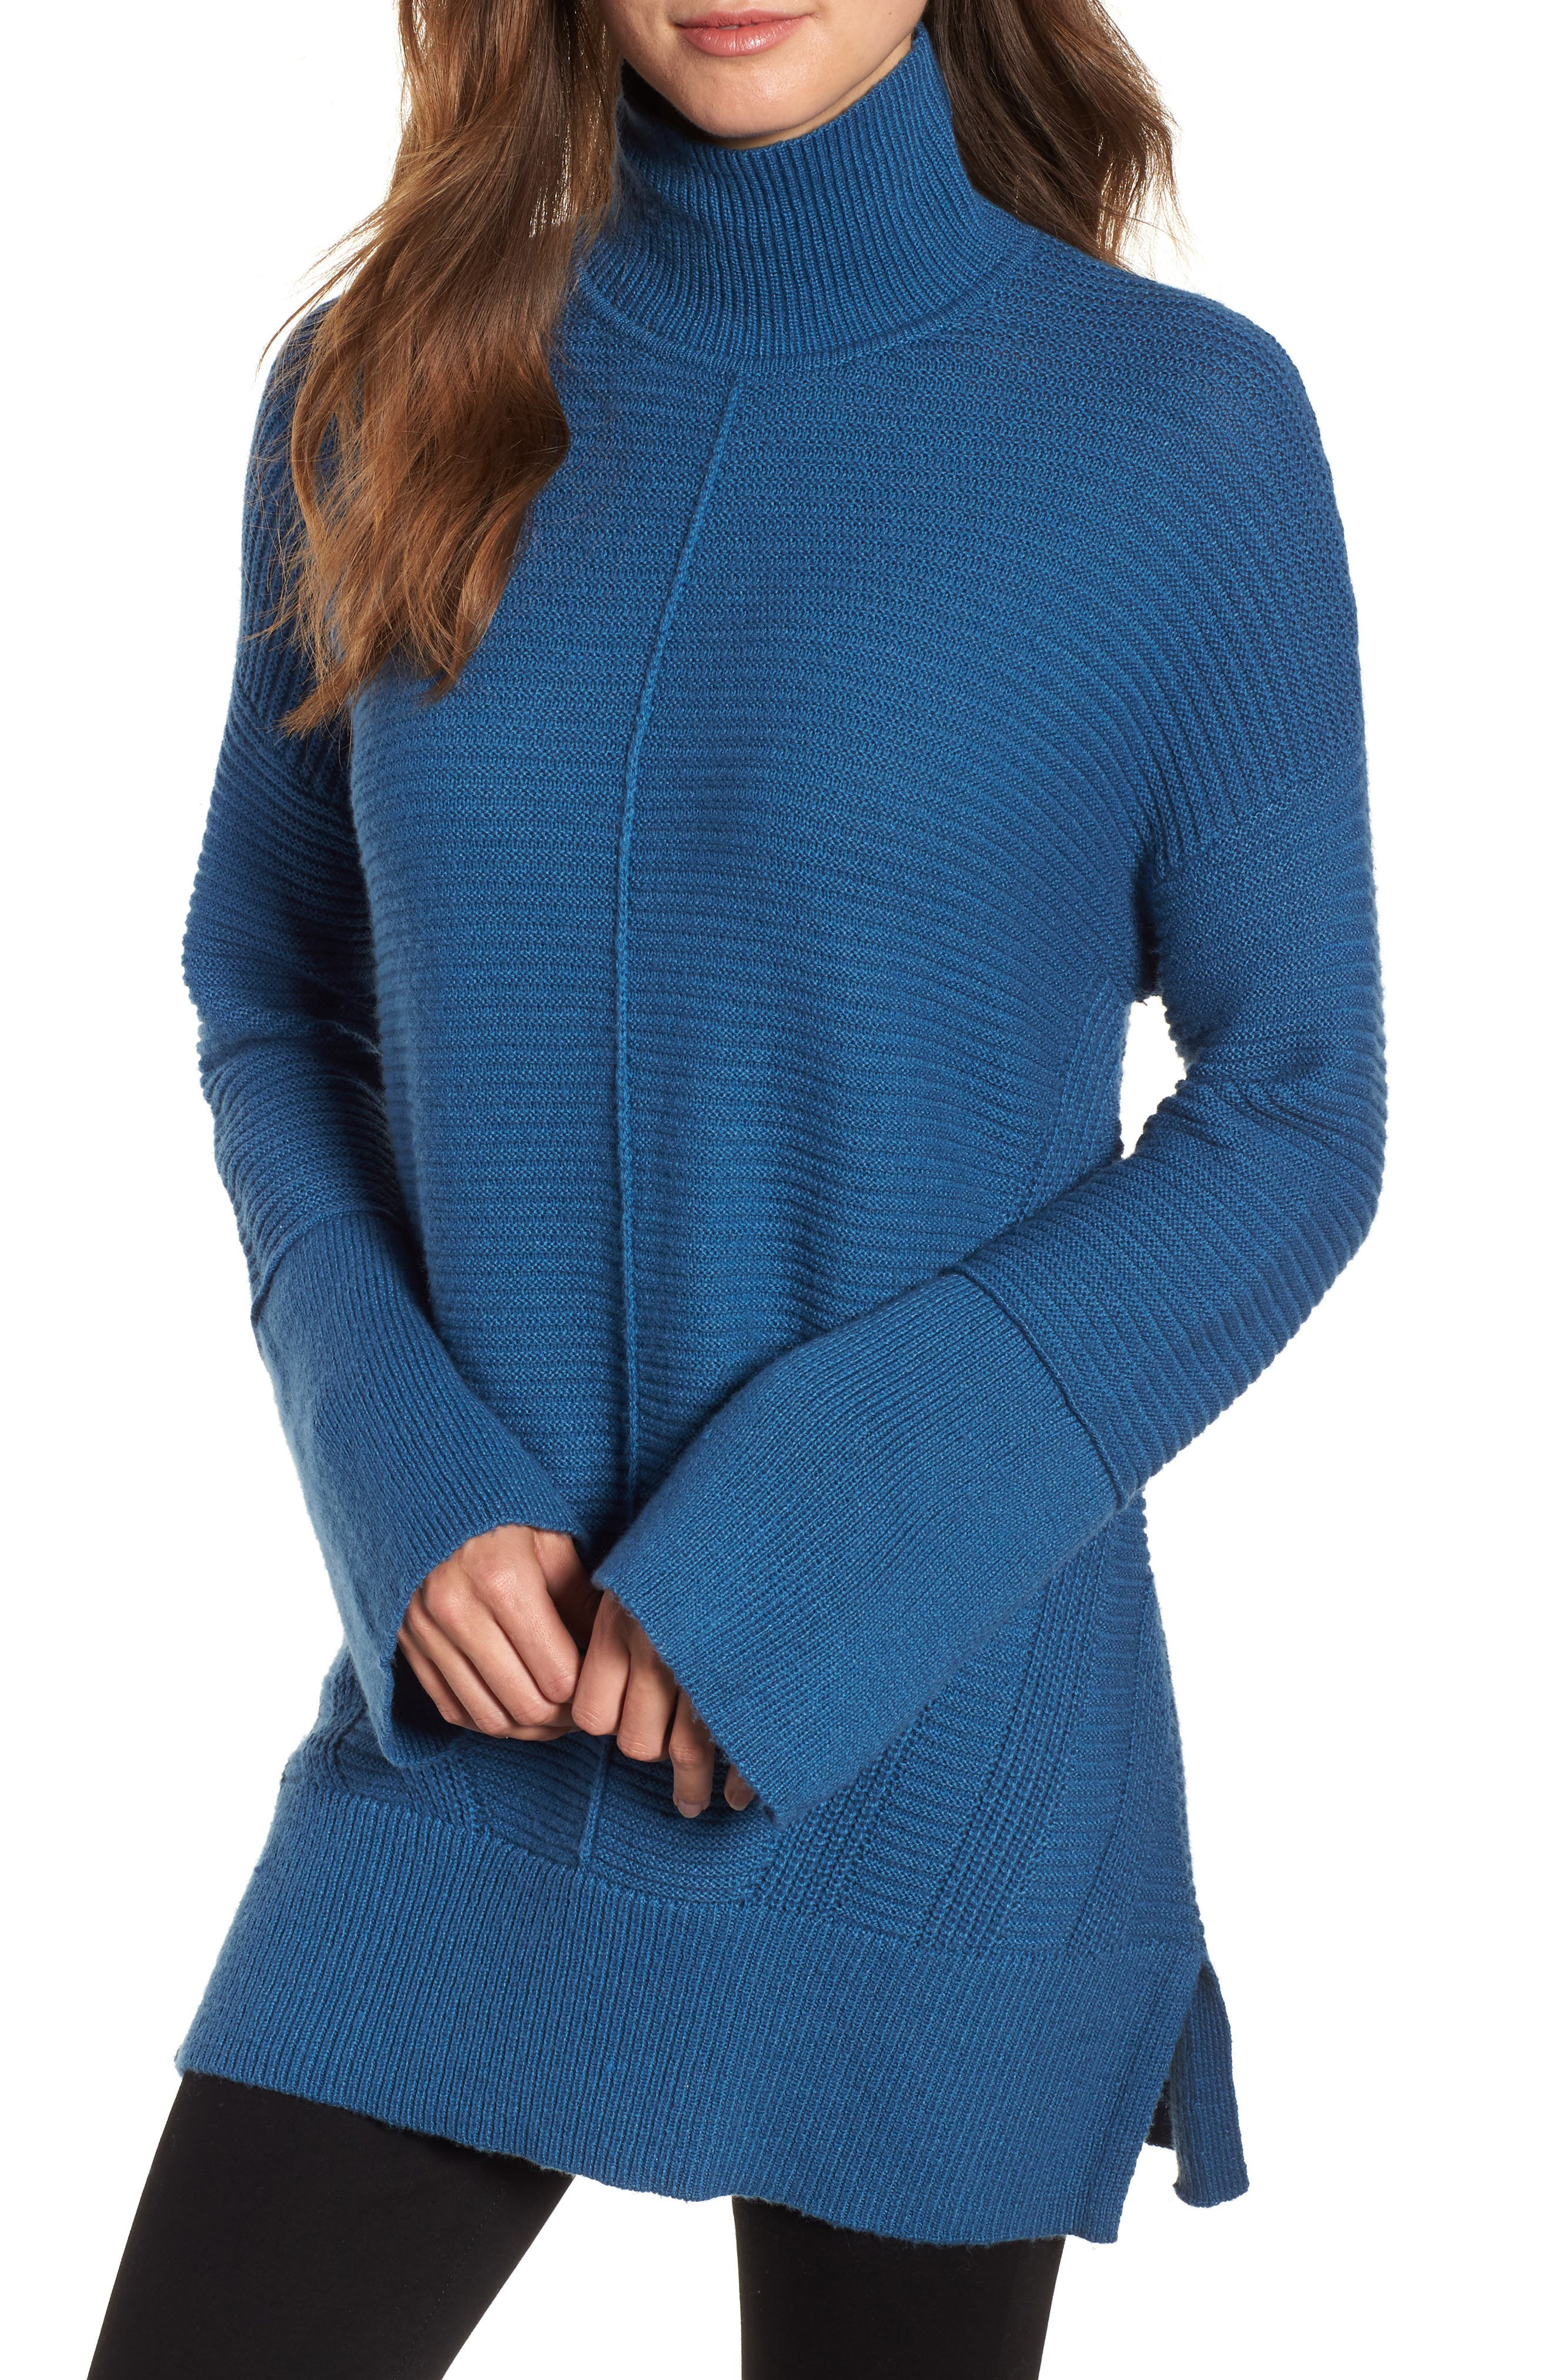 Ribbed Turtleneck Tunic Sweater,                             Main thumbnail 1, color,                             BLUE DARK